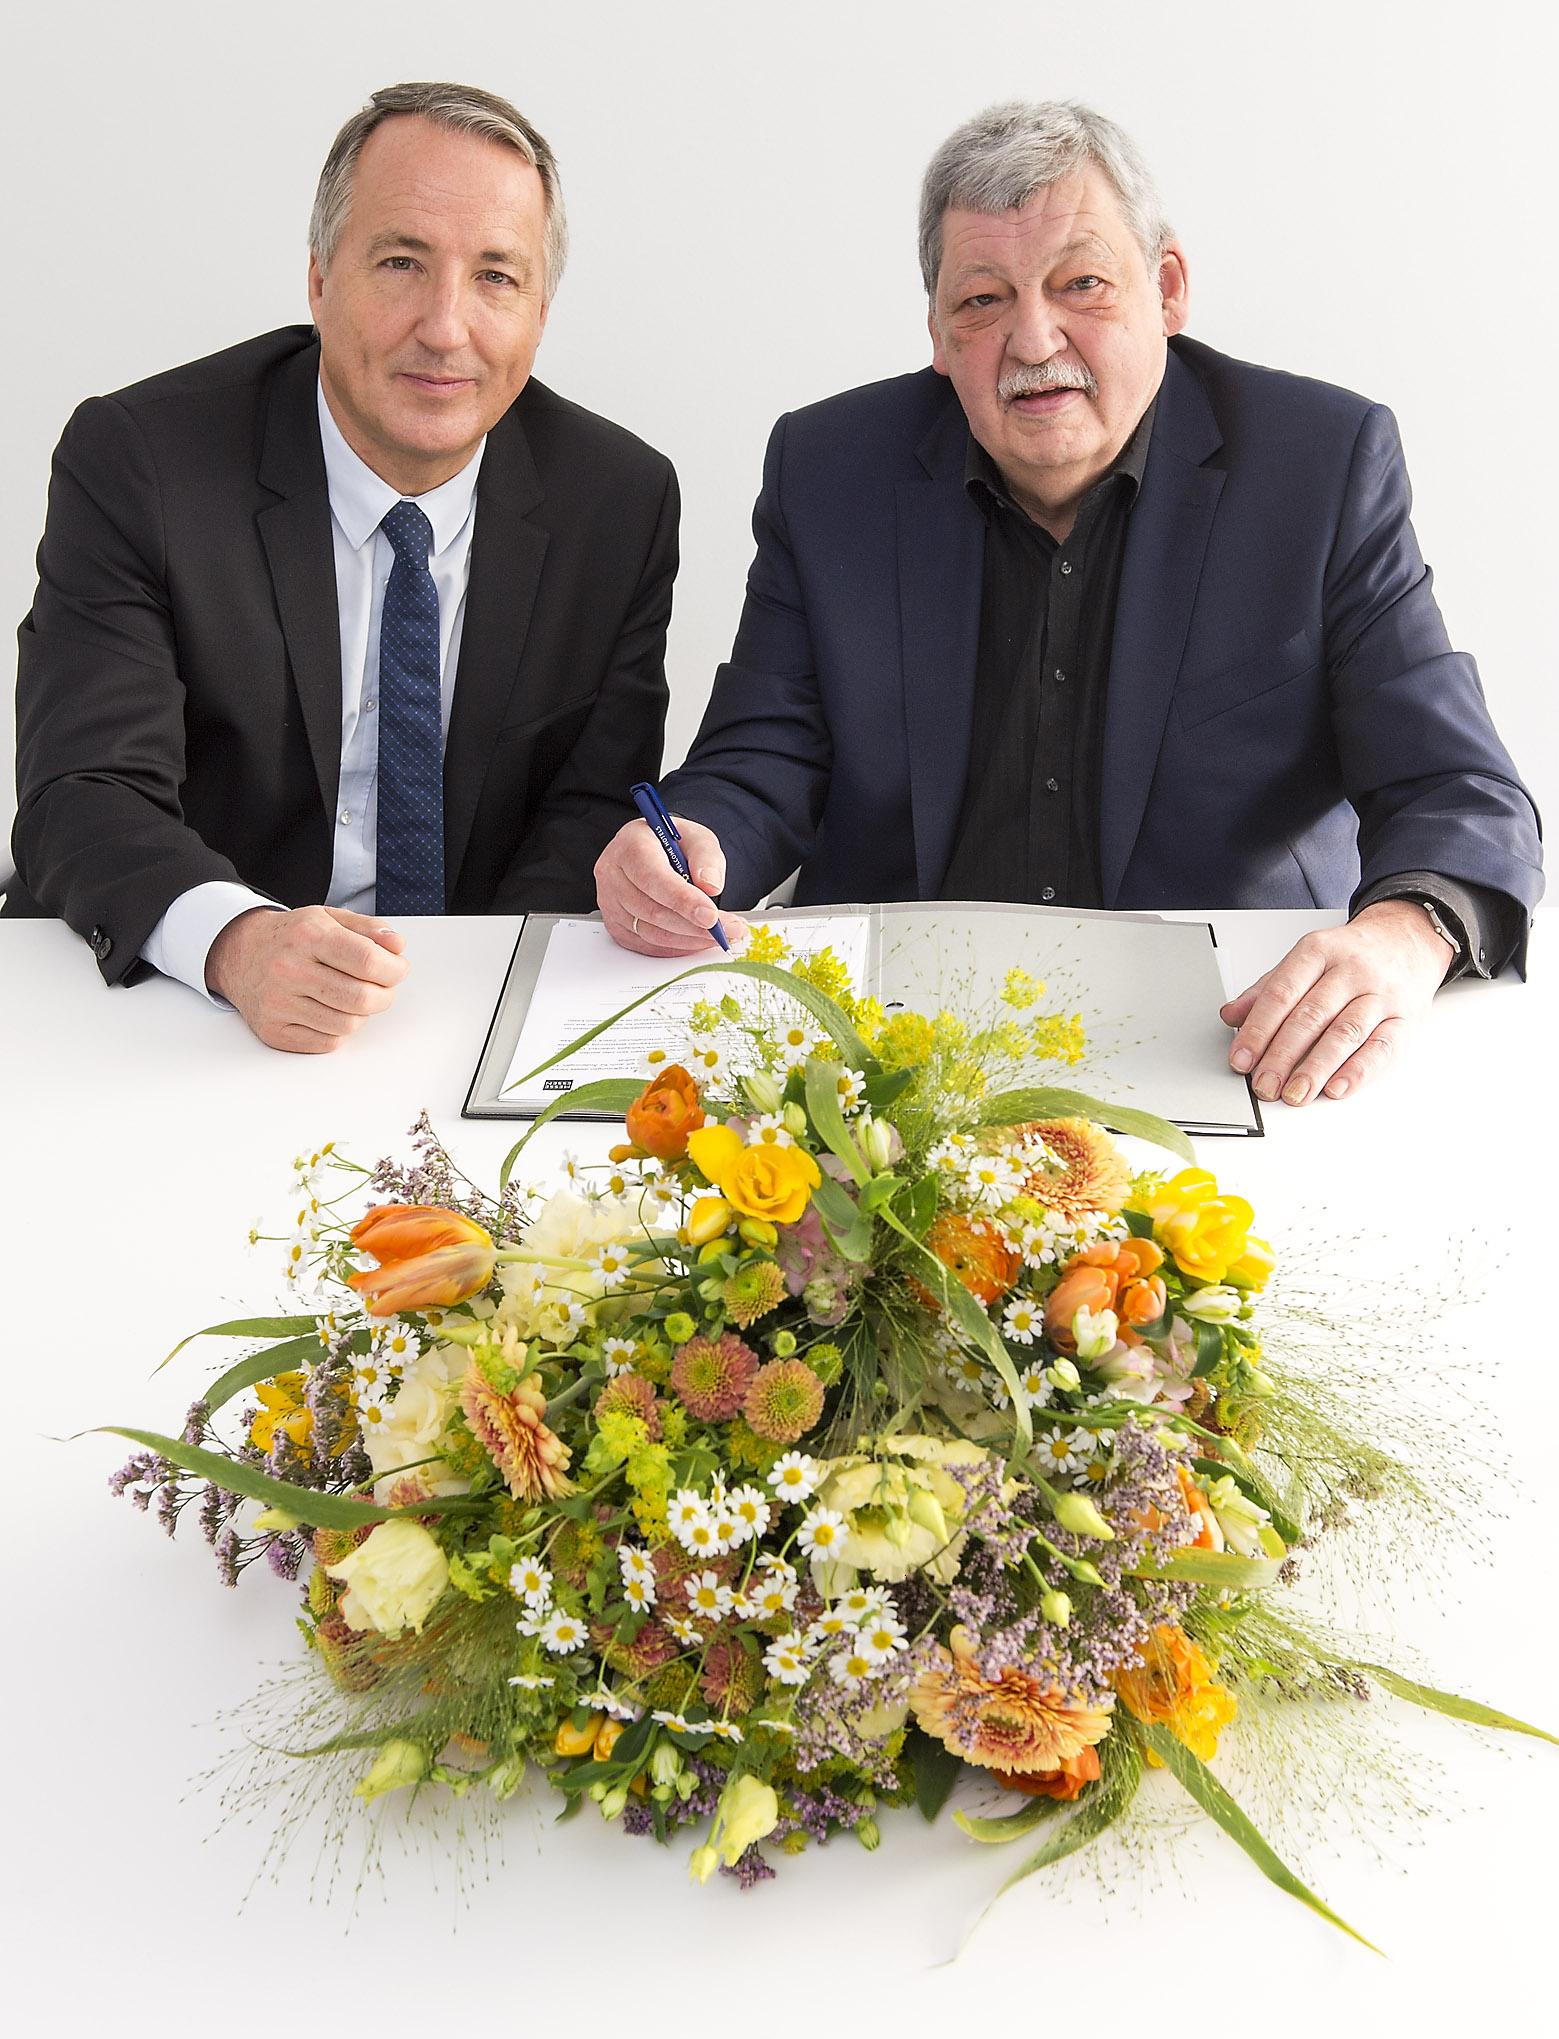 Messe Essen and Trade Association of German Florists (FDF)